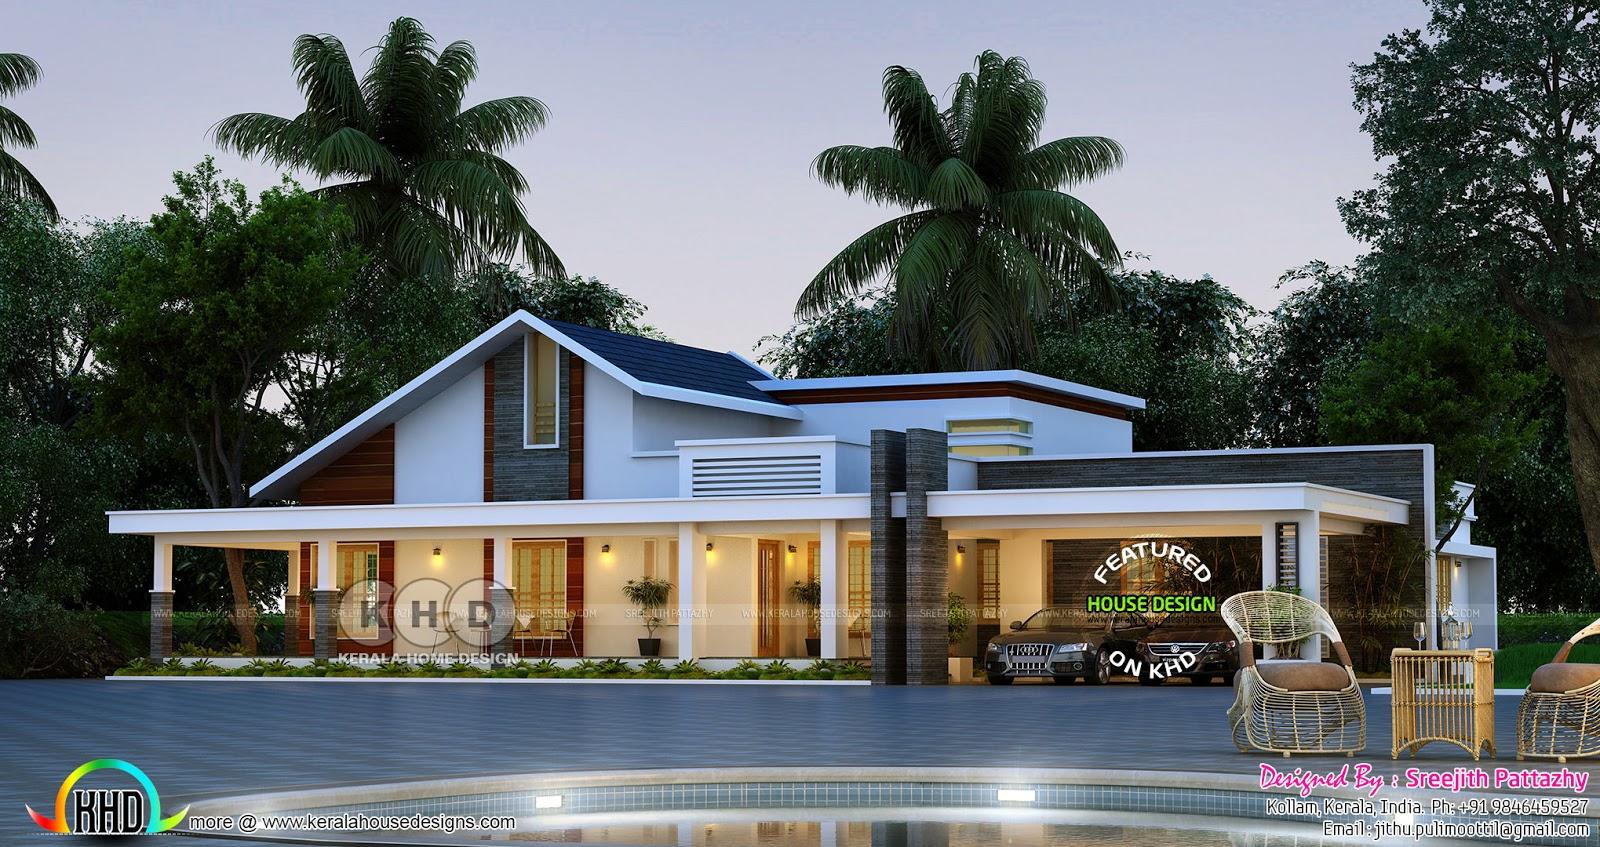 2706 Sq Ft Mixed Roof Single Floor House Kerala Home Design Bloglovin